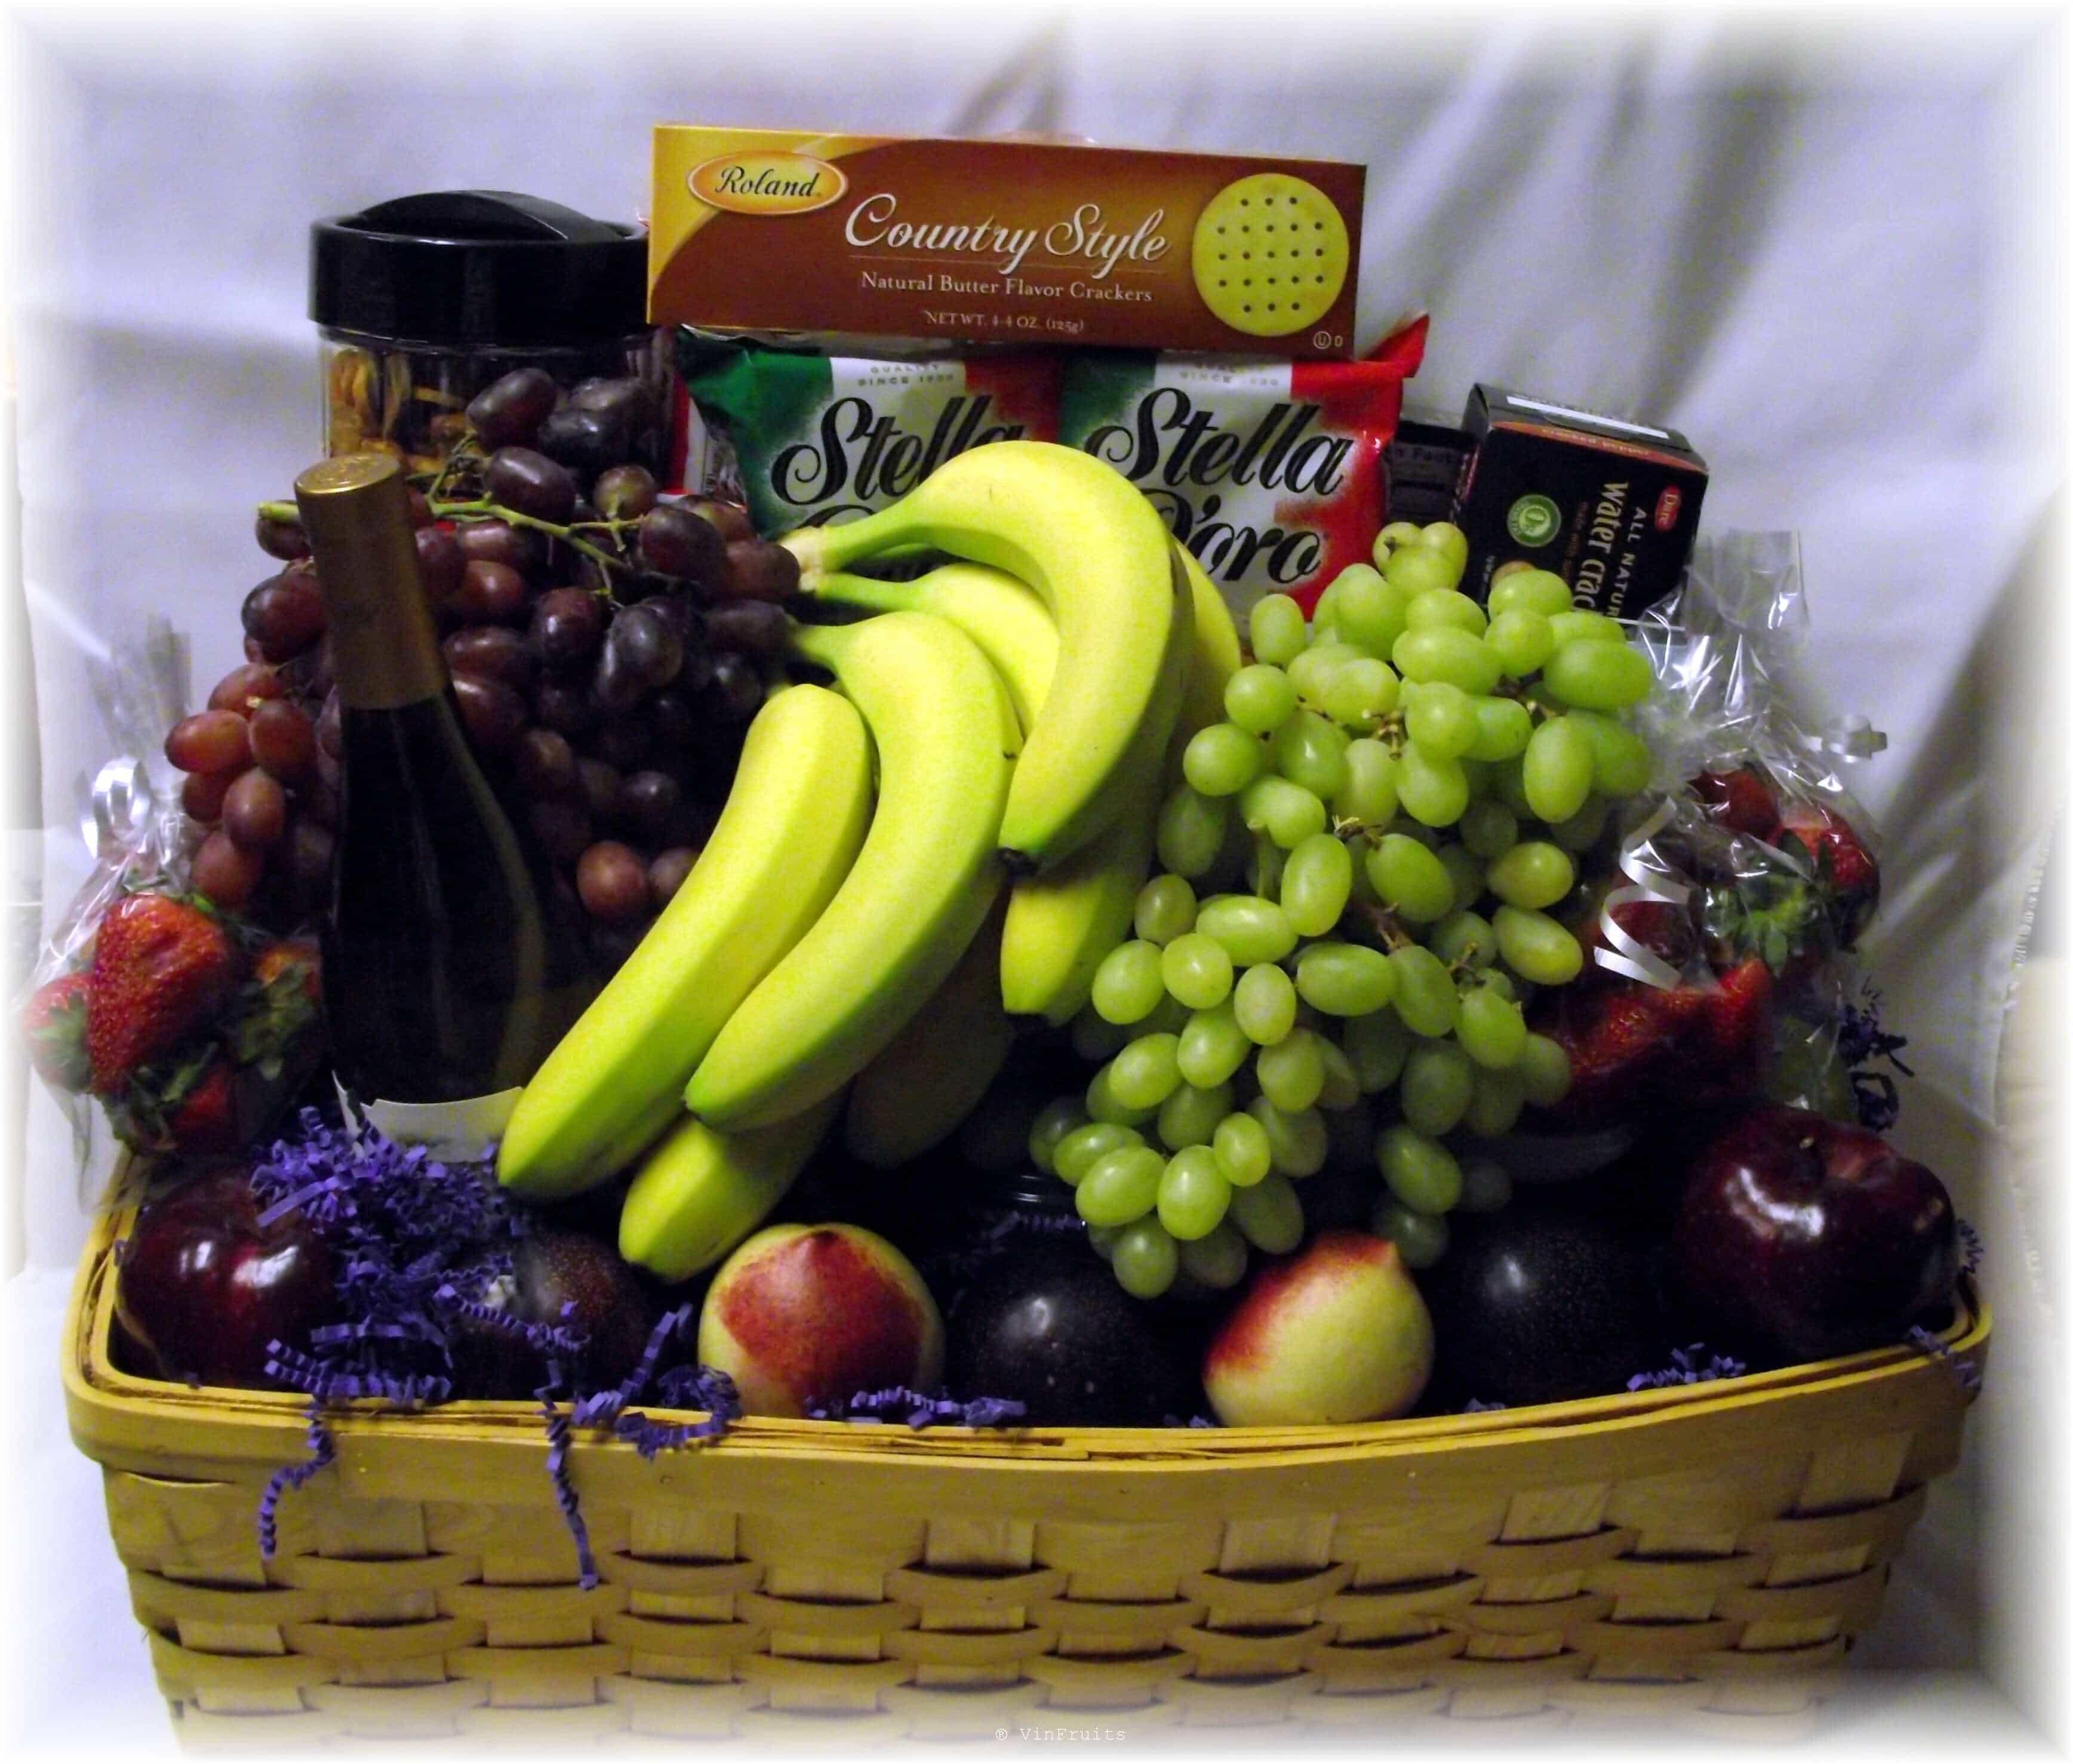 Giỏ trái cây cao cấp tặng sếp - VinFruits